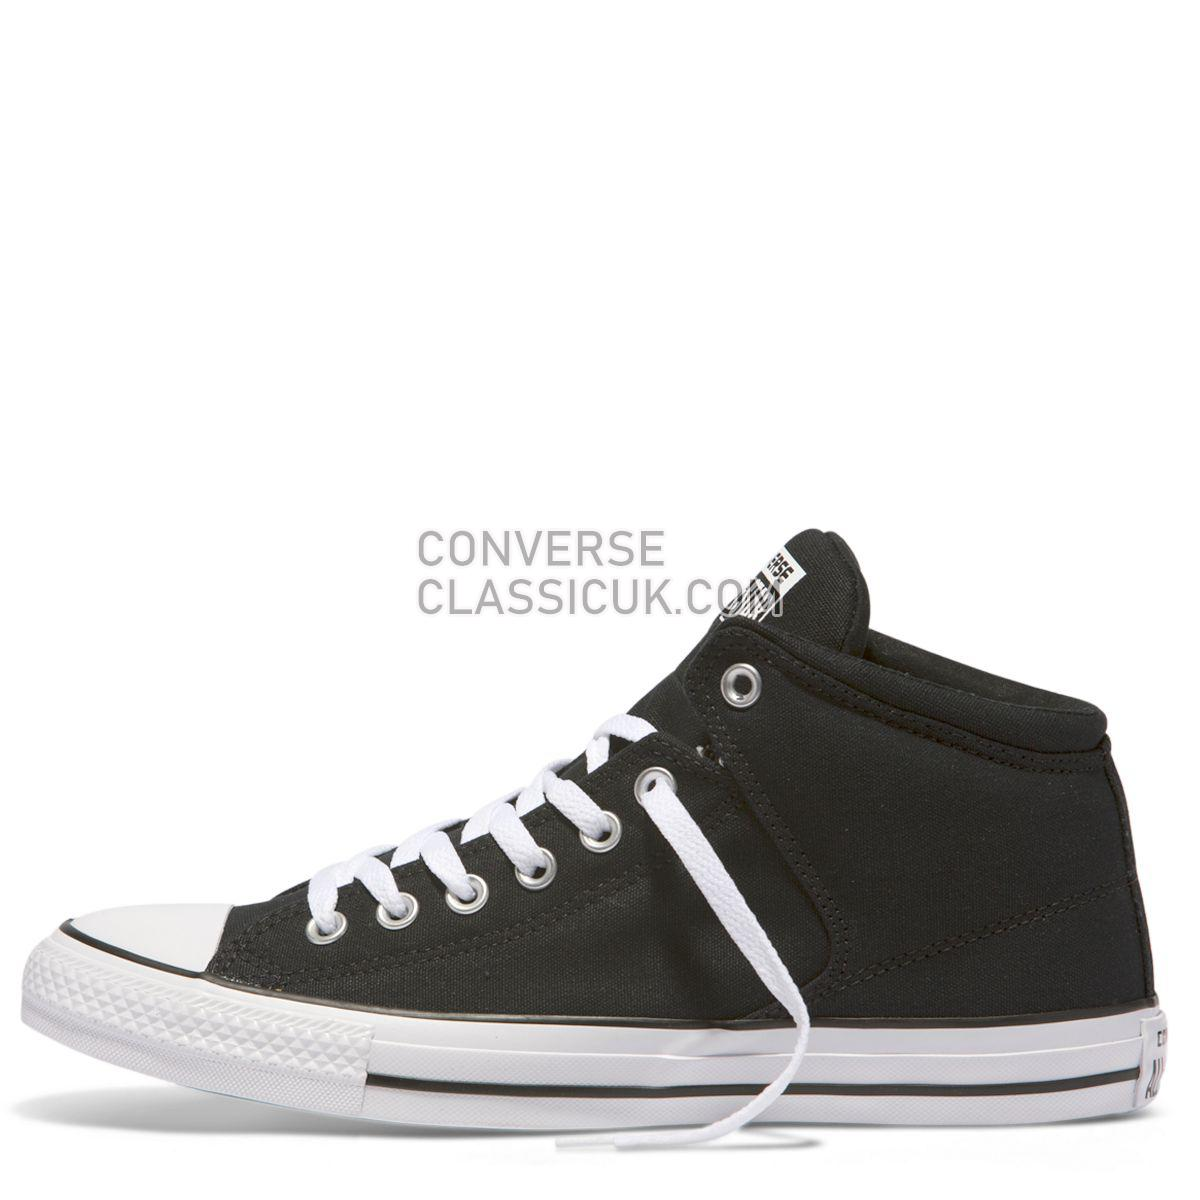 Converse Chuck Taylor All Star High Street Mid Black Mens Womens Unisex 151041 Black/Black/White Shoes